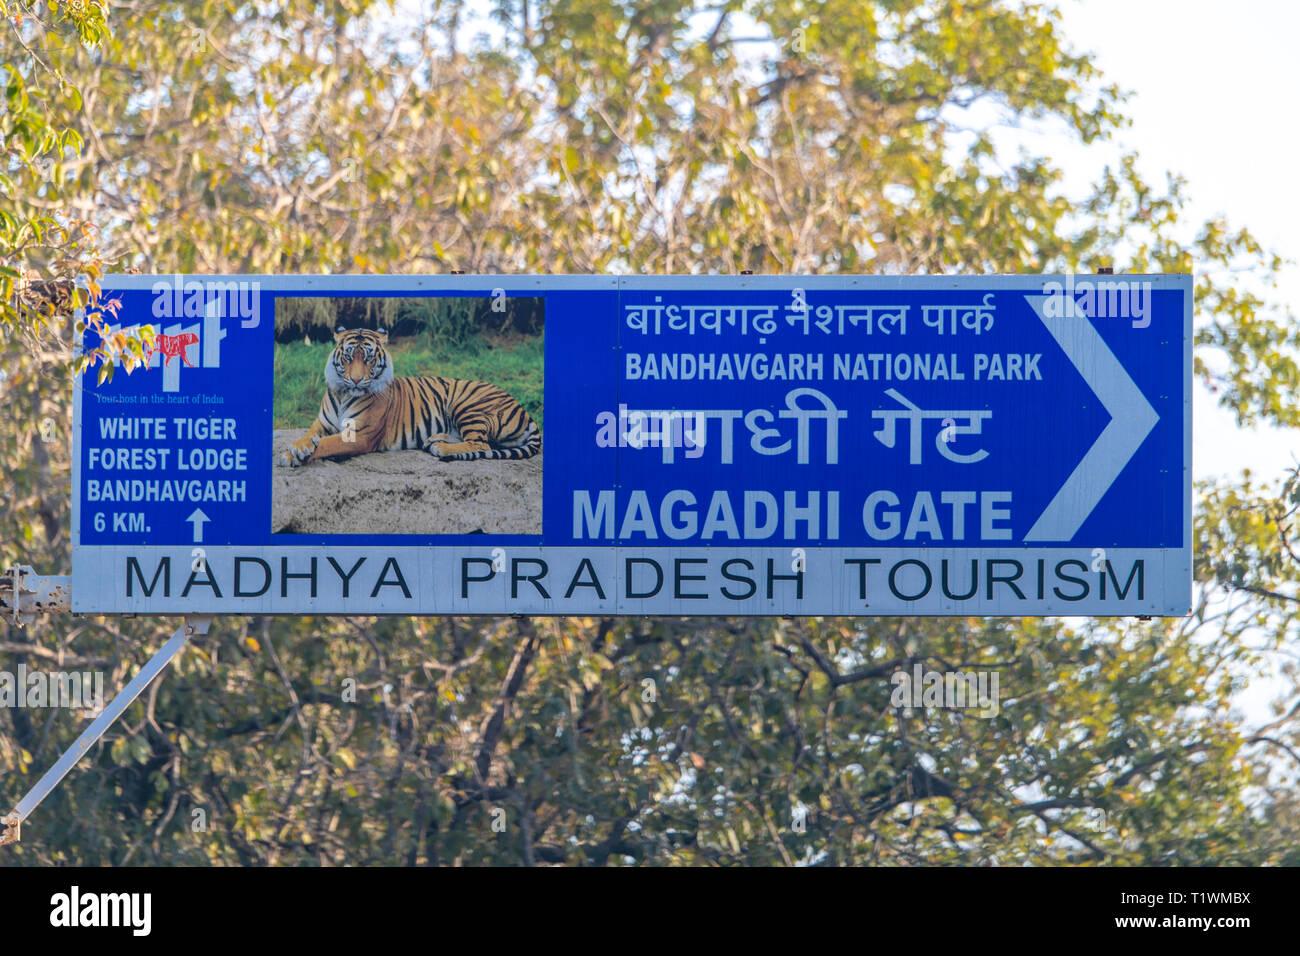 Sign indicates entrance via Magadhi Gate for Bandhavgarh National Park - Stock Image